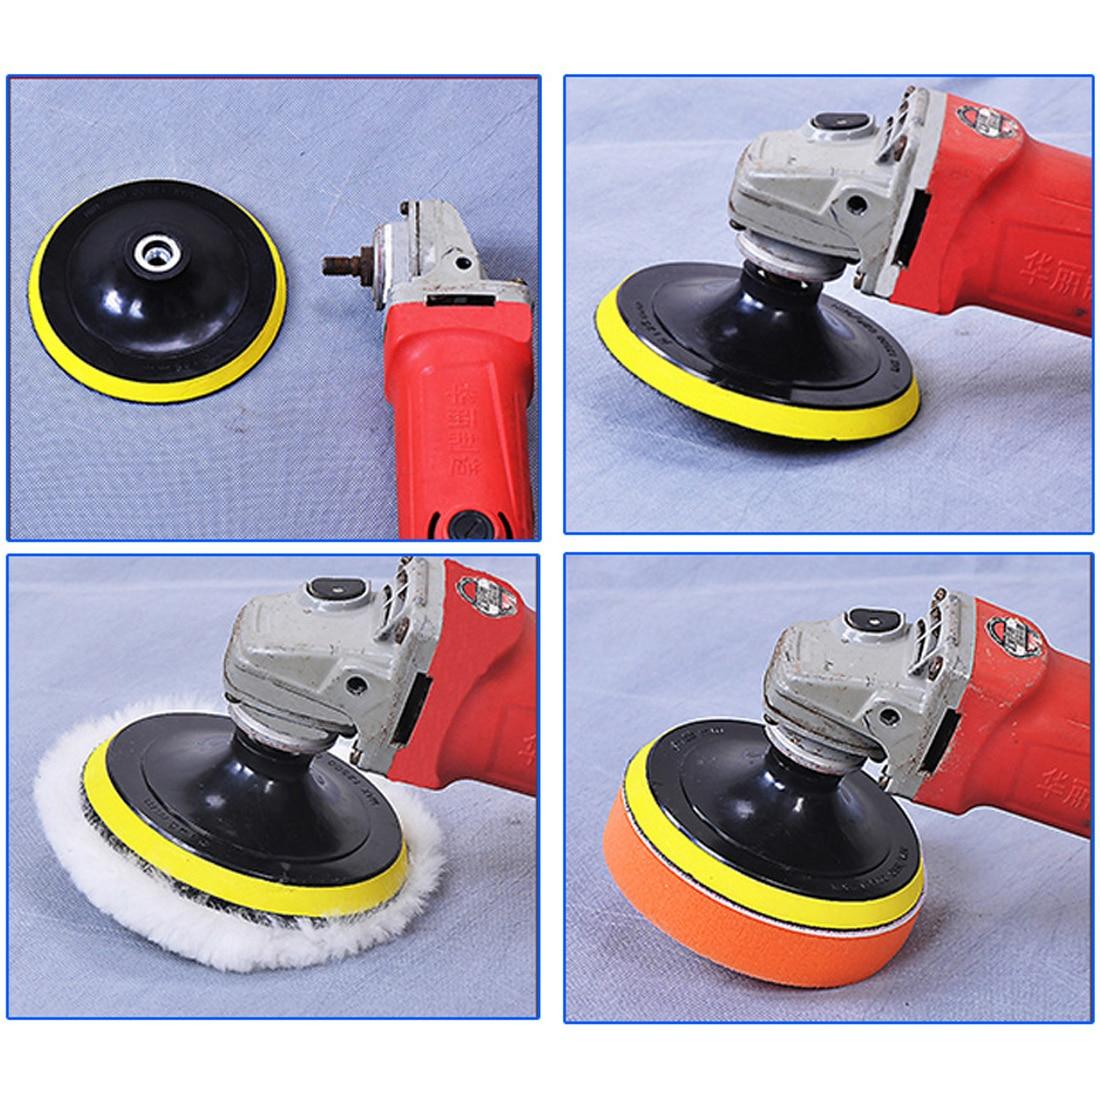 цена на 7pcs/set 3 Car Polishing Pad Polishing Buffer Waxing Buffing Pad Drill Set Kit Car Polishing Sponge Wheel Kit Polisher